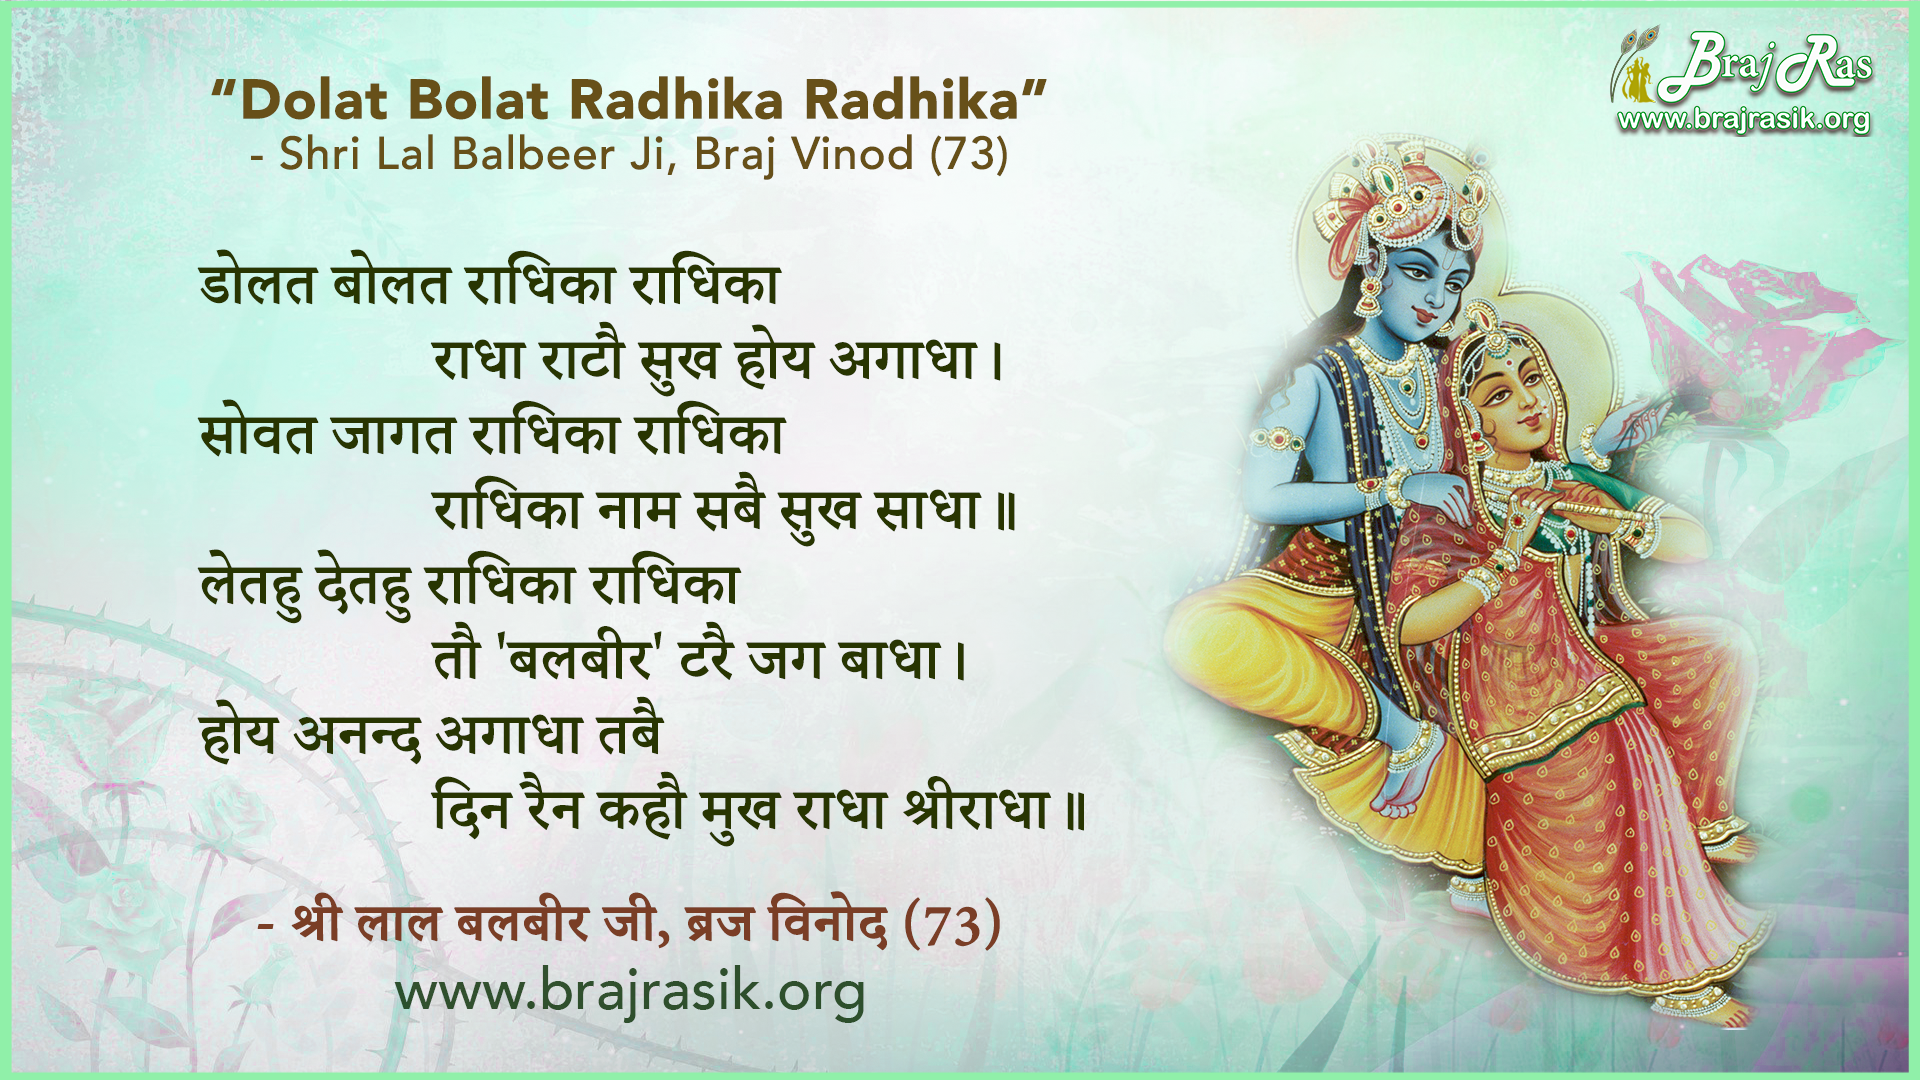 Dolat Bolat Radhika Radhika - Shri Lal Balbeer Ji, Braj Vinod (73)